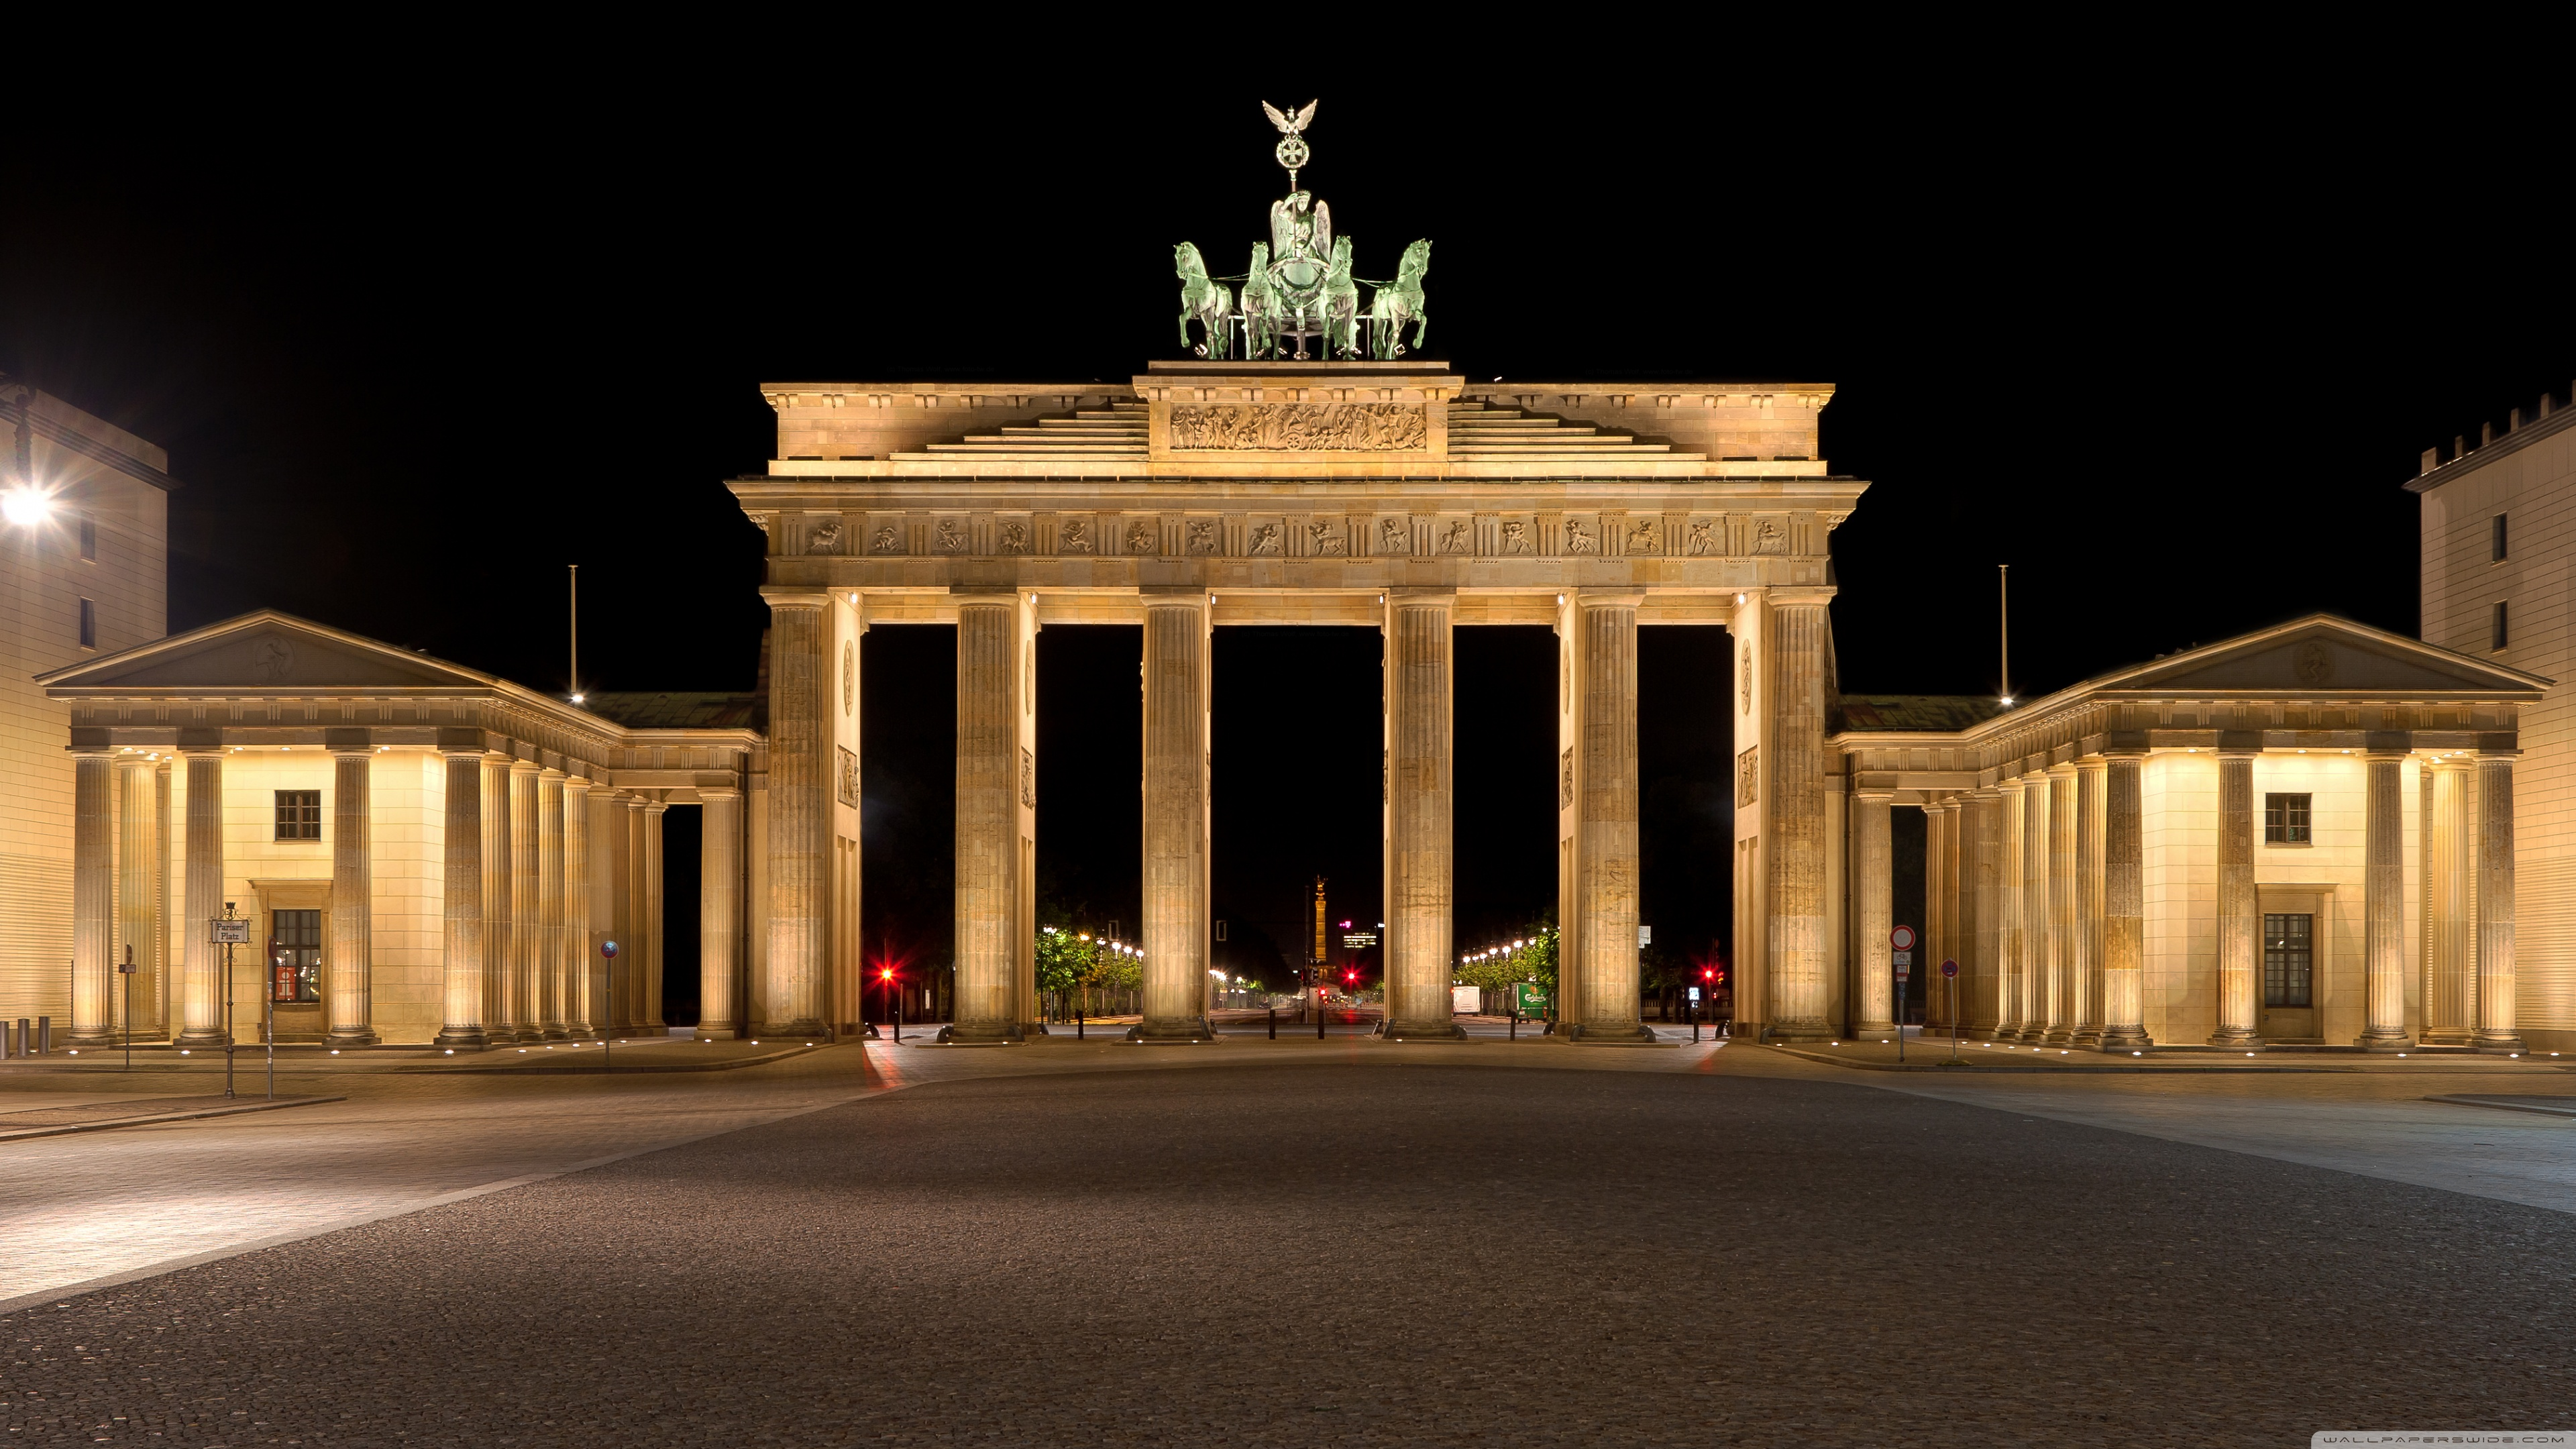 Brandenburg Gate 4K HD Desktop Wallpaper for 4K Ultra HD TV 3840x2160